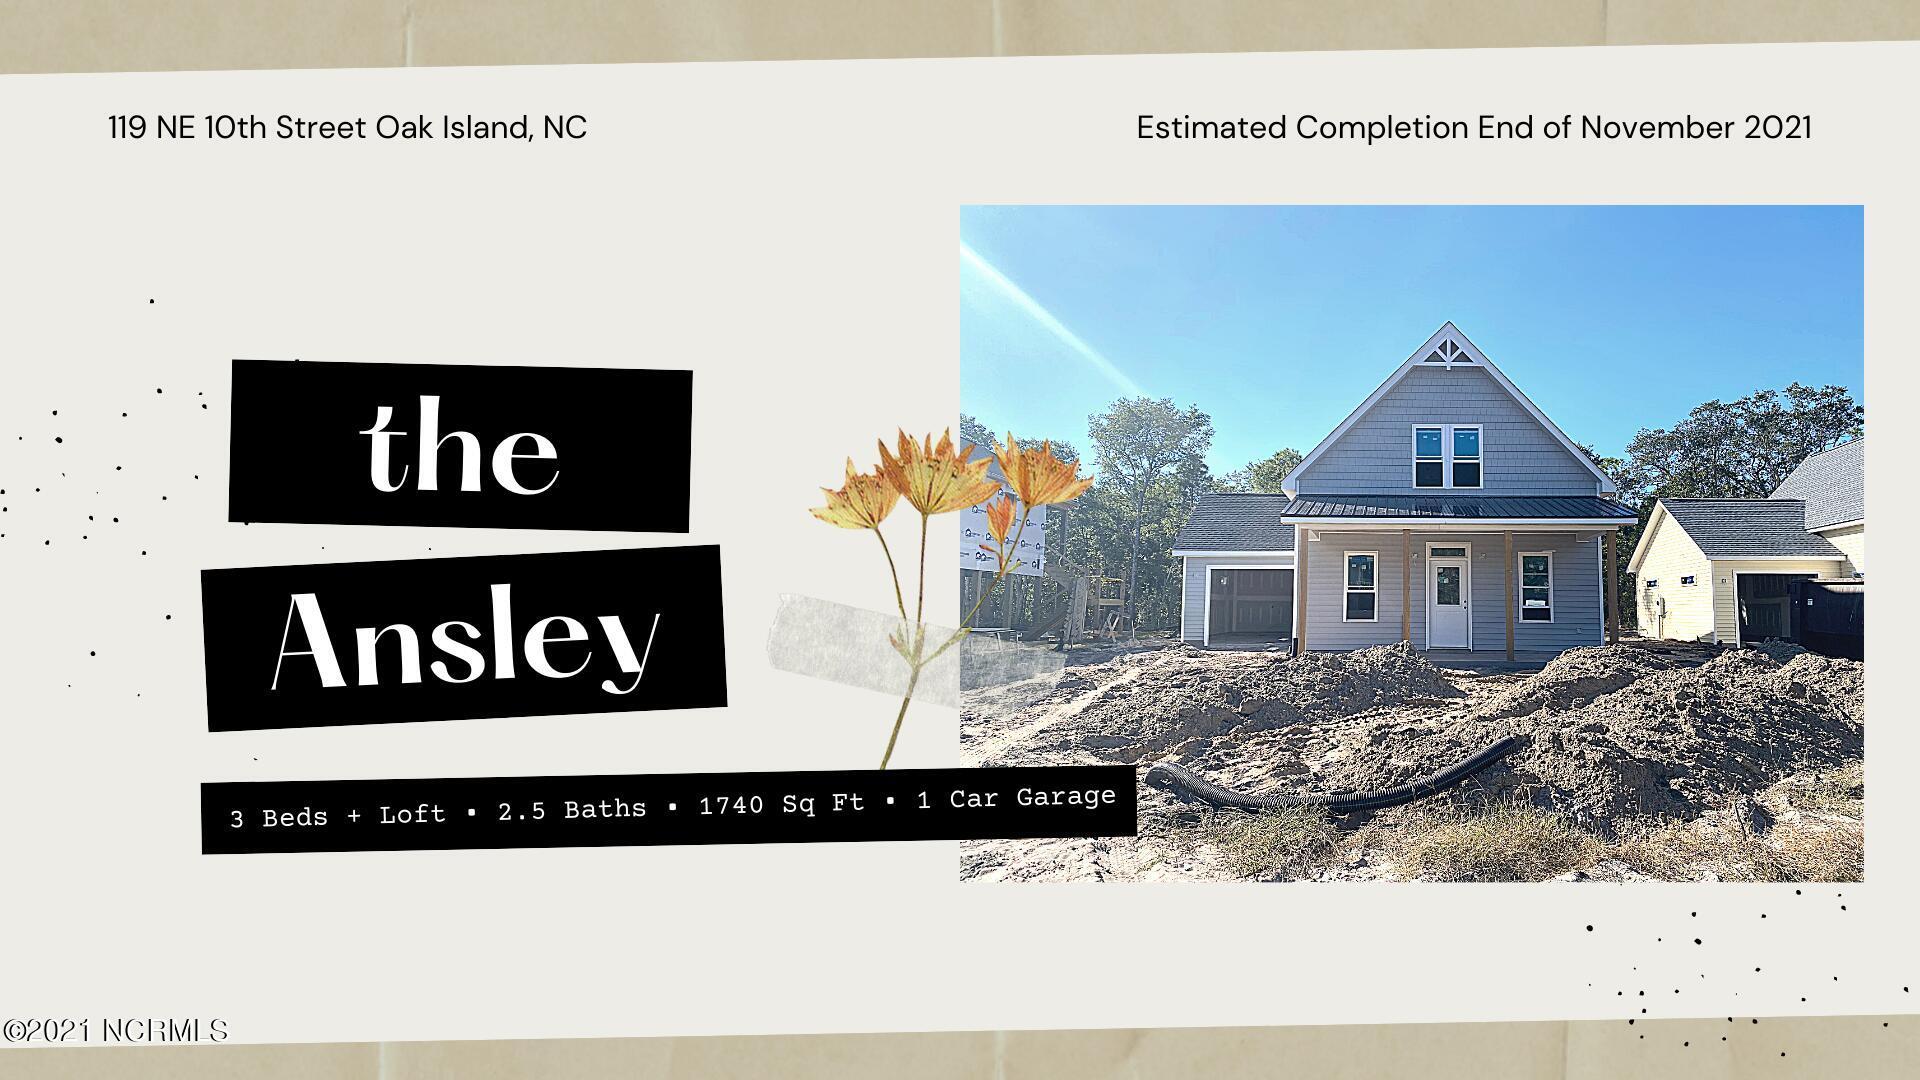 119 NE 10th Street Oak Island, NC 28465